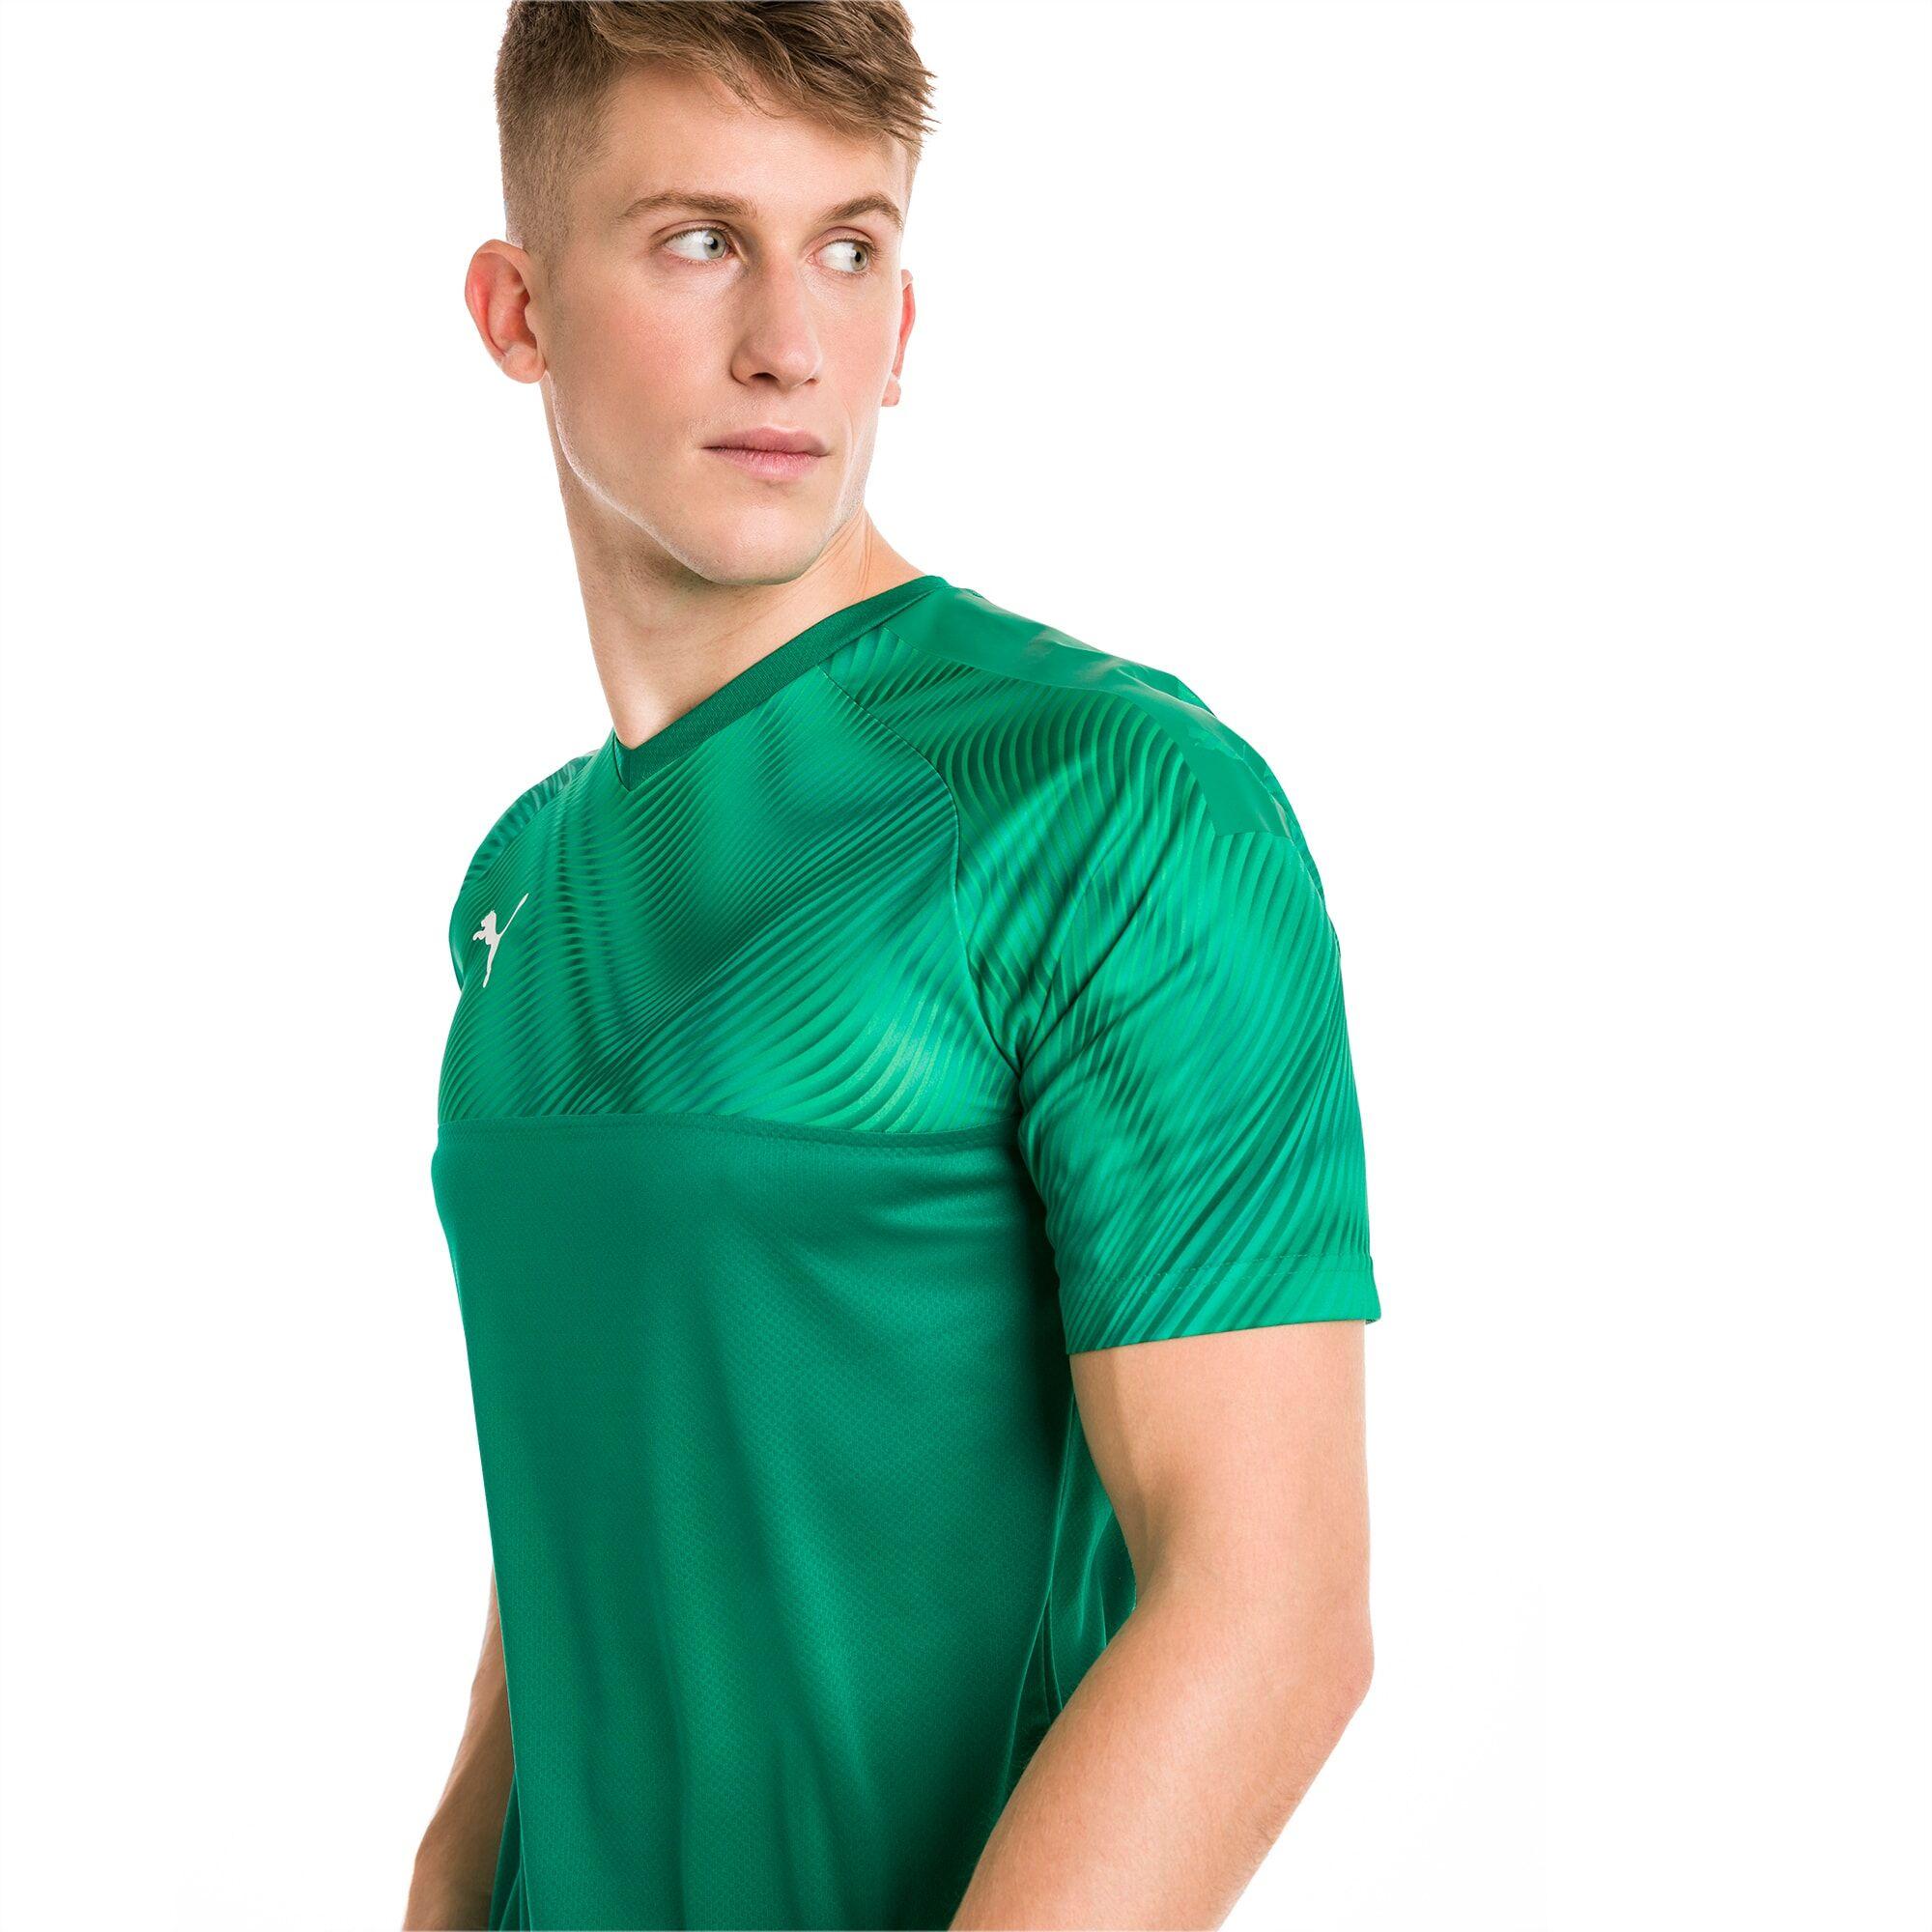 PUMA Maillot Football CUP pour Homme, Vert/Blanc, Taille XS, Vêtements